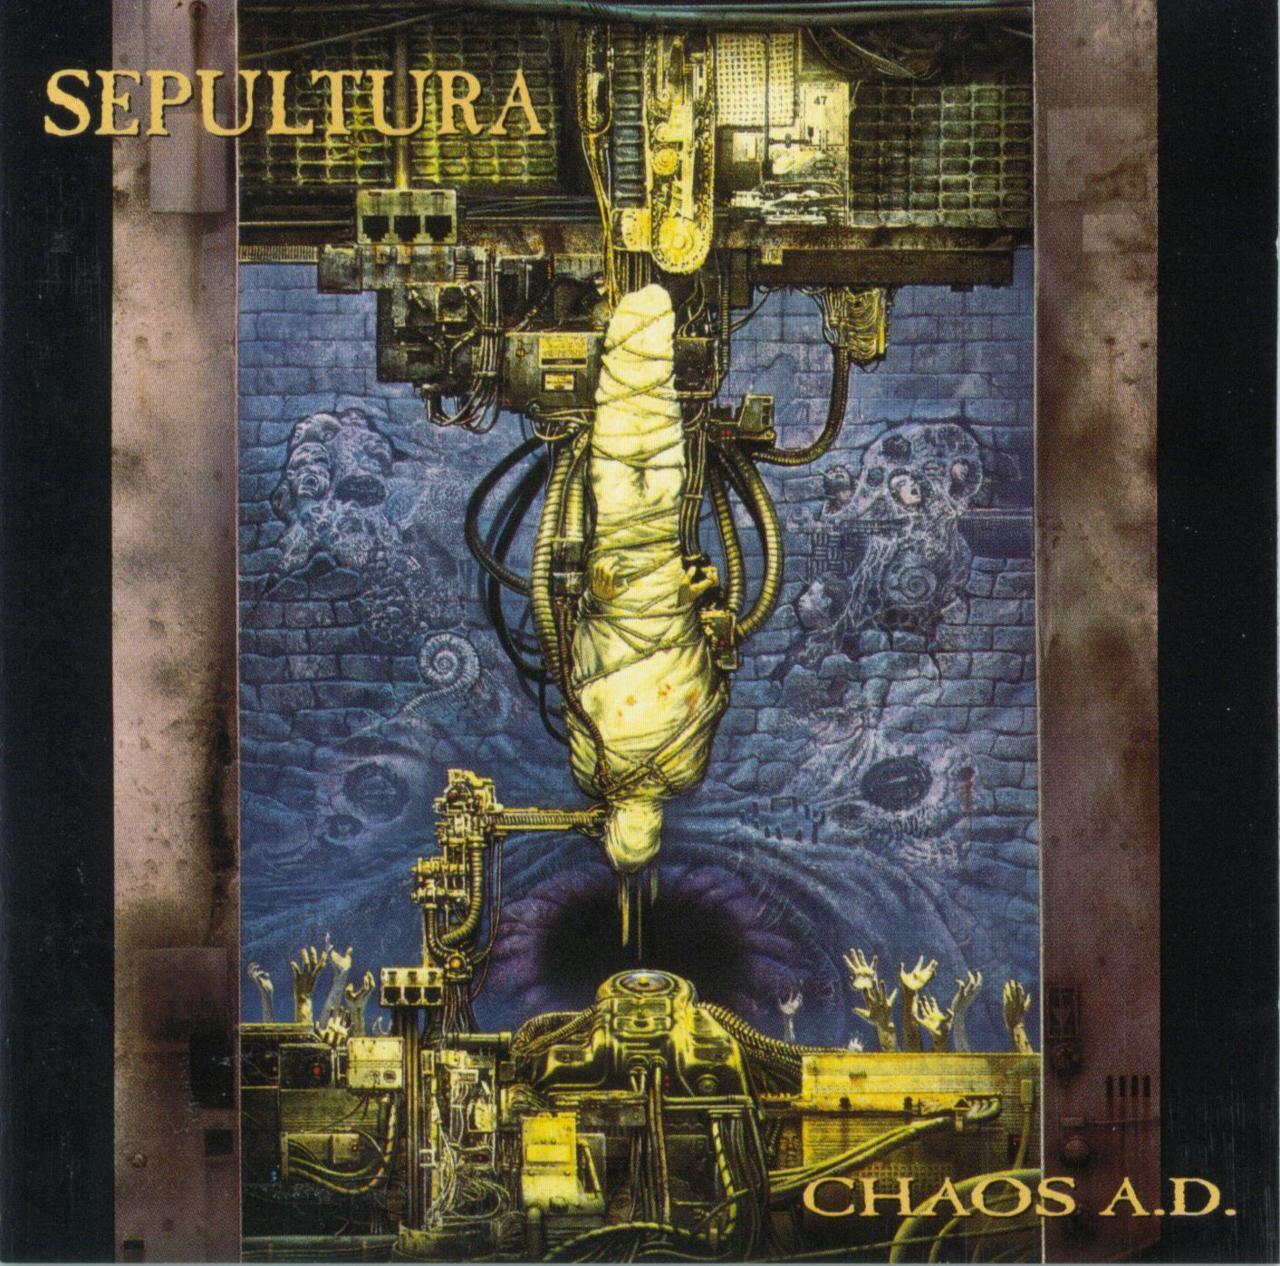 On the HI FI: Sepultura- Chaos AD #formative  Via  http://www.youtube.com/watch?v=6ODNxy3YOPU